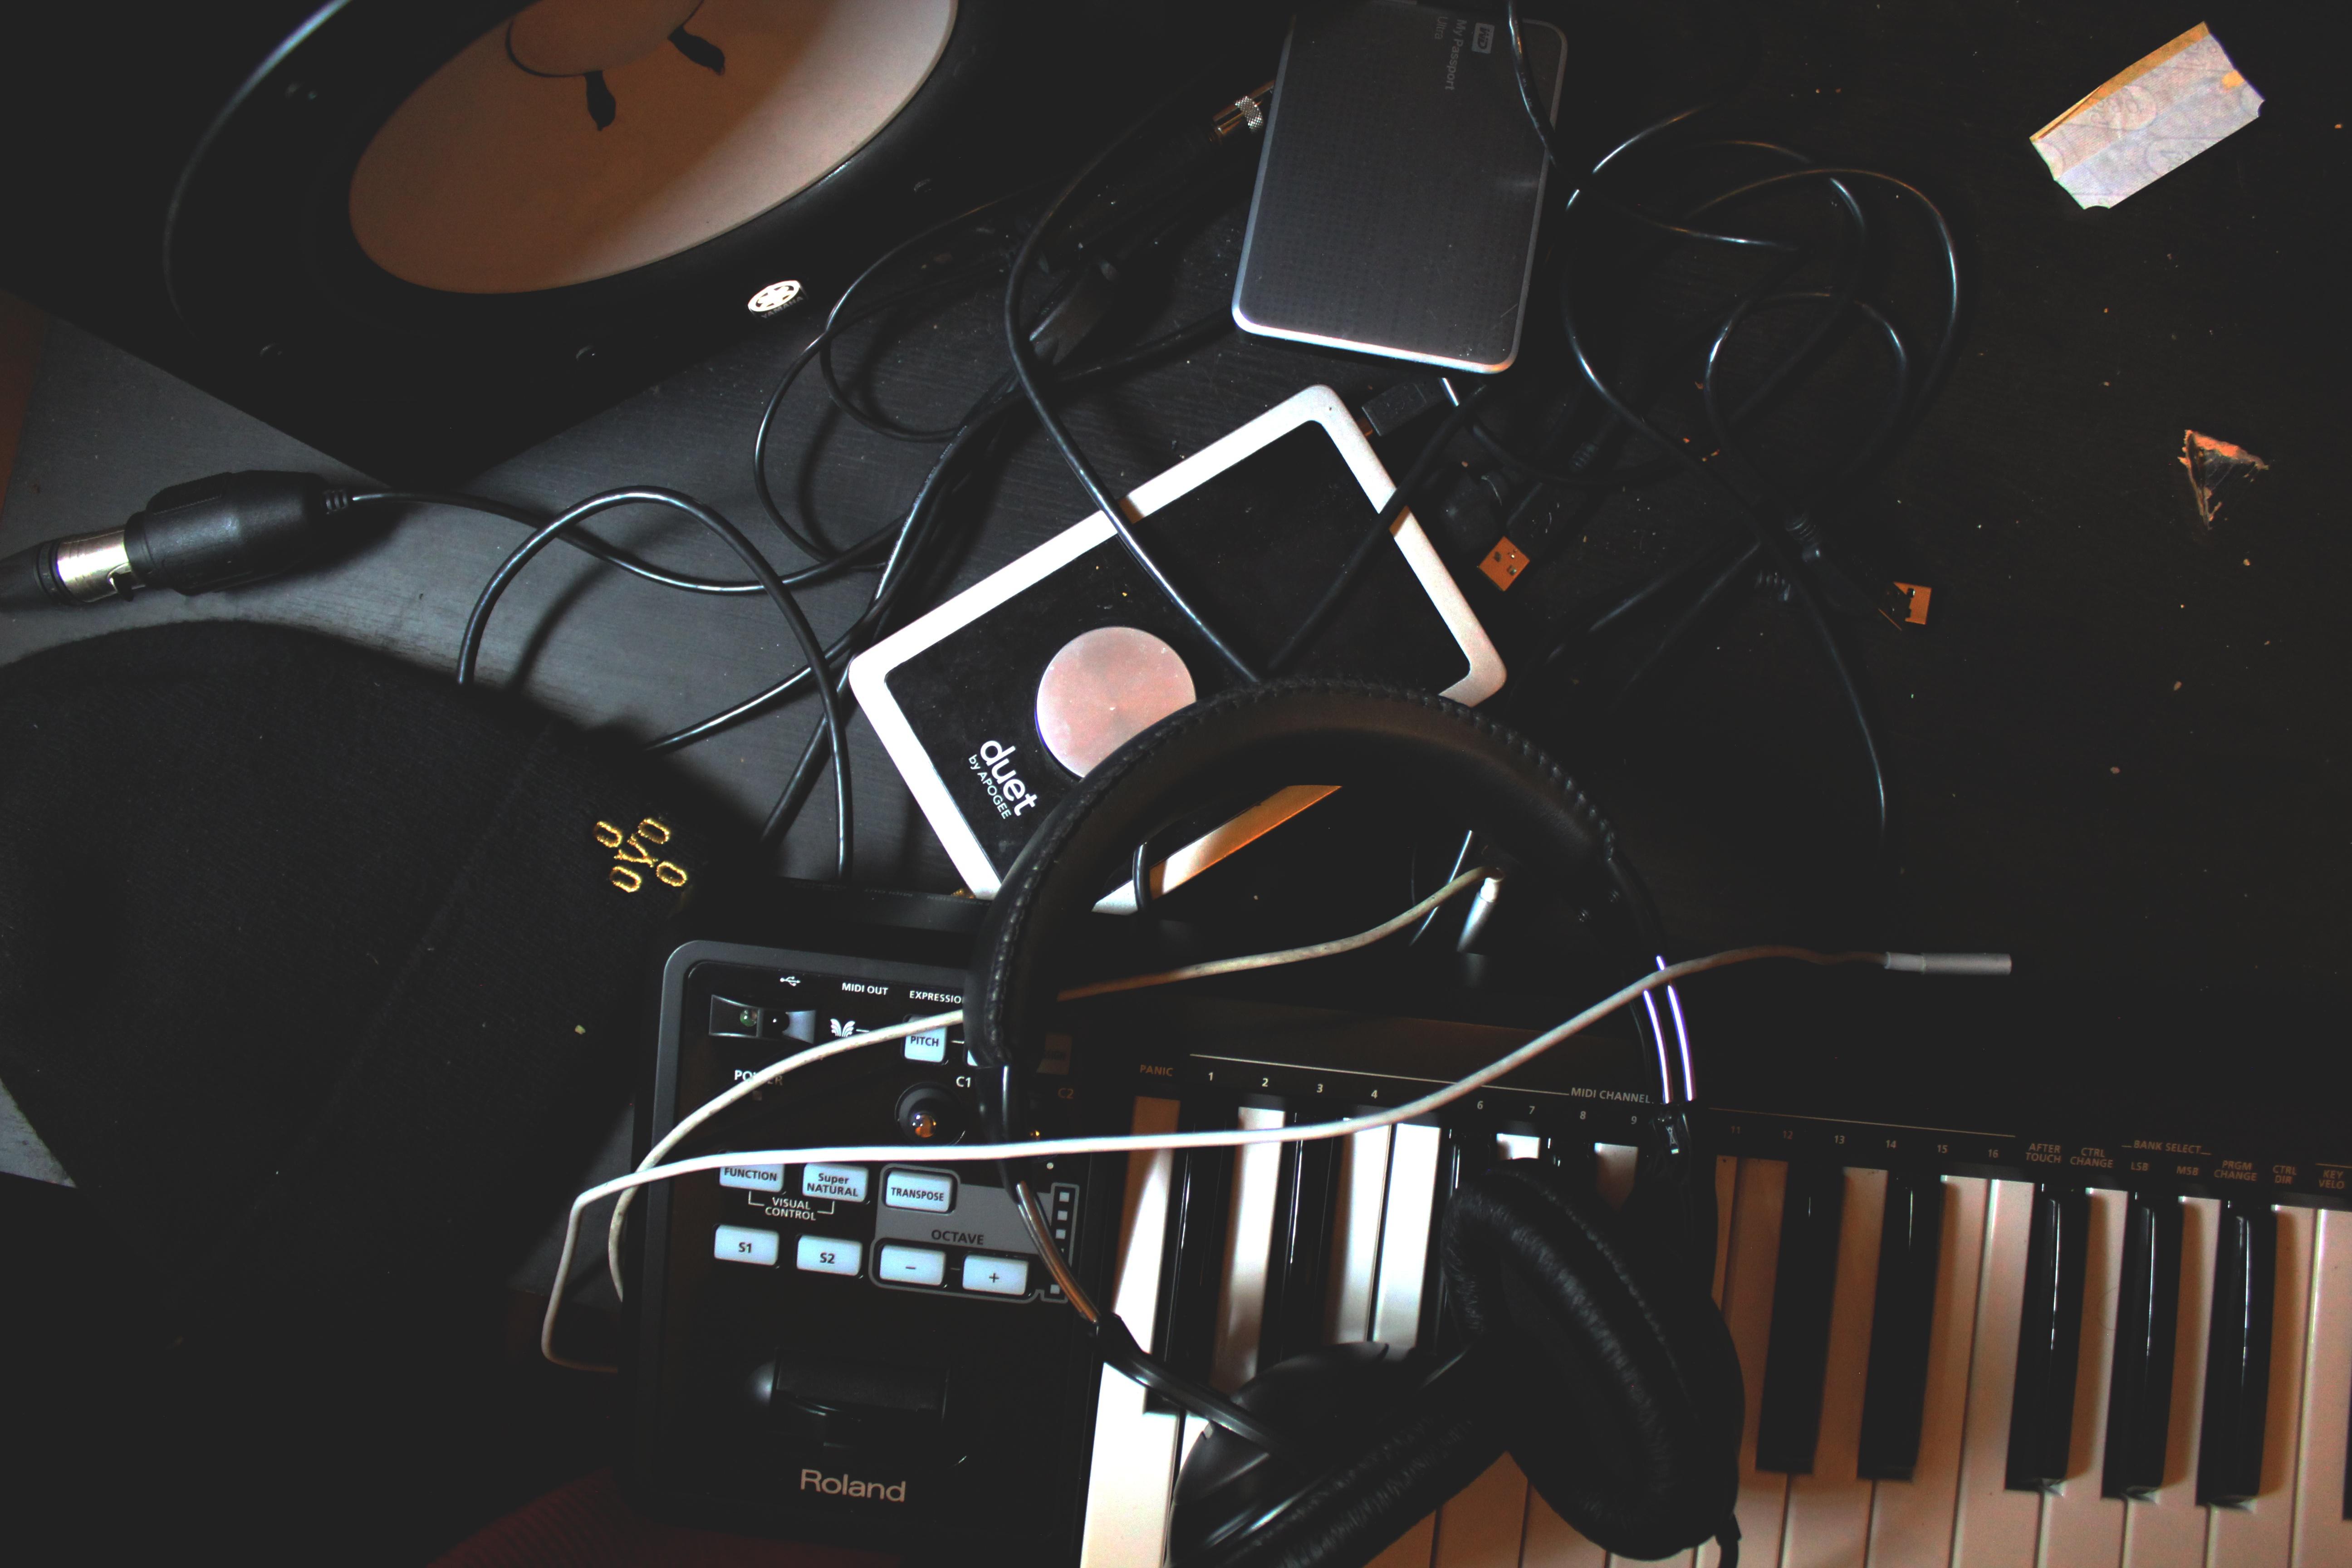 foto muzyka